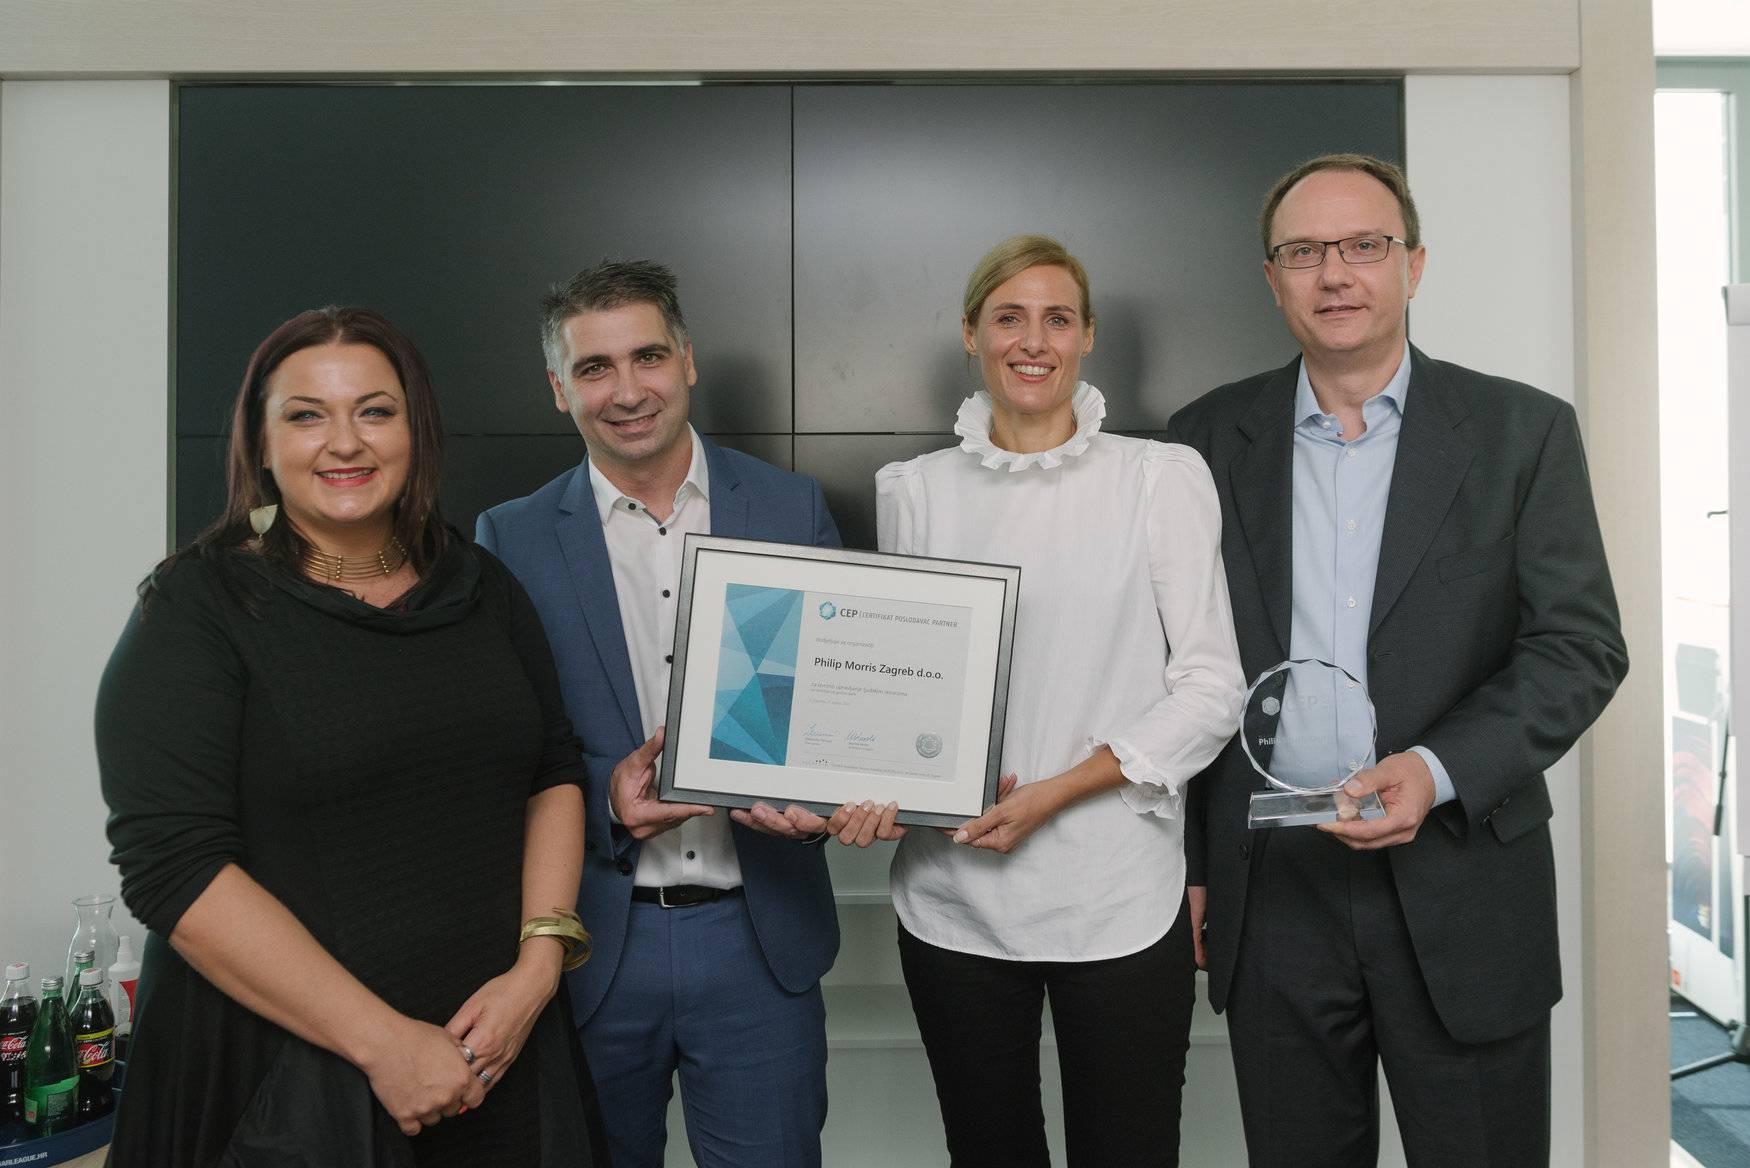 Philip Morris Zagreb predan razvoju talenata i kulture uključivosti